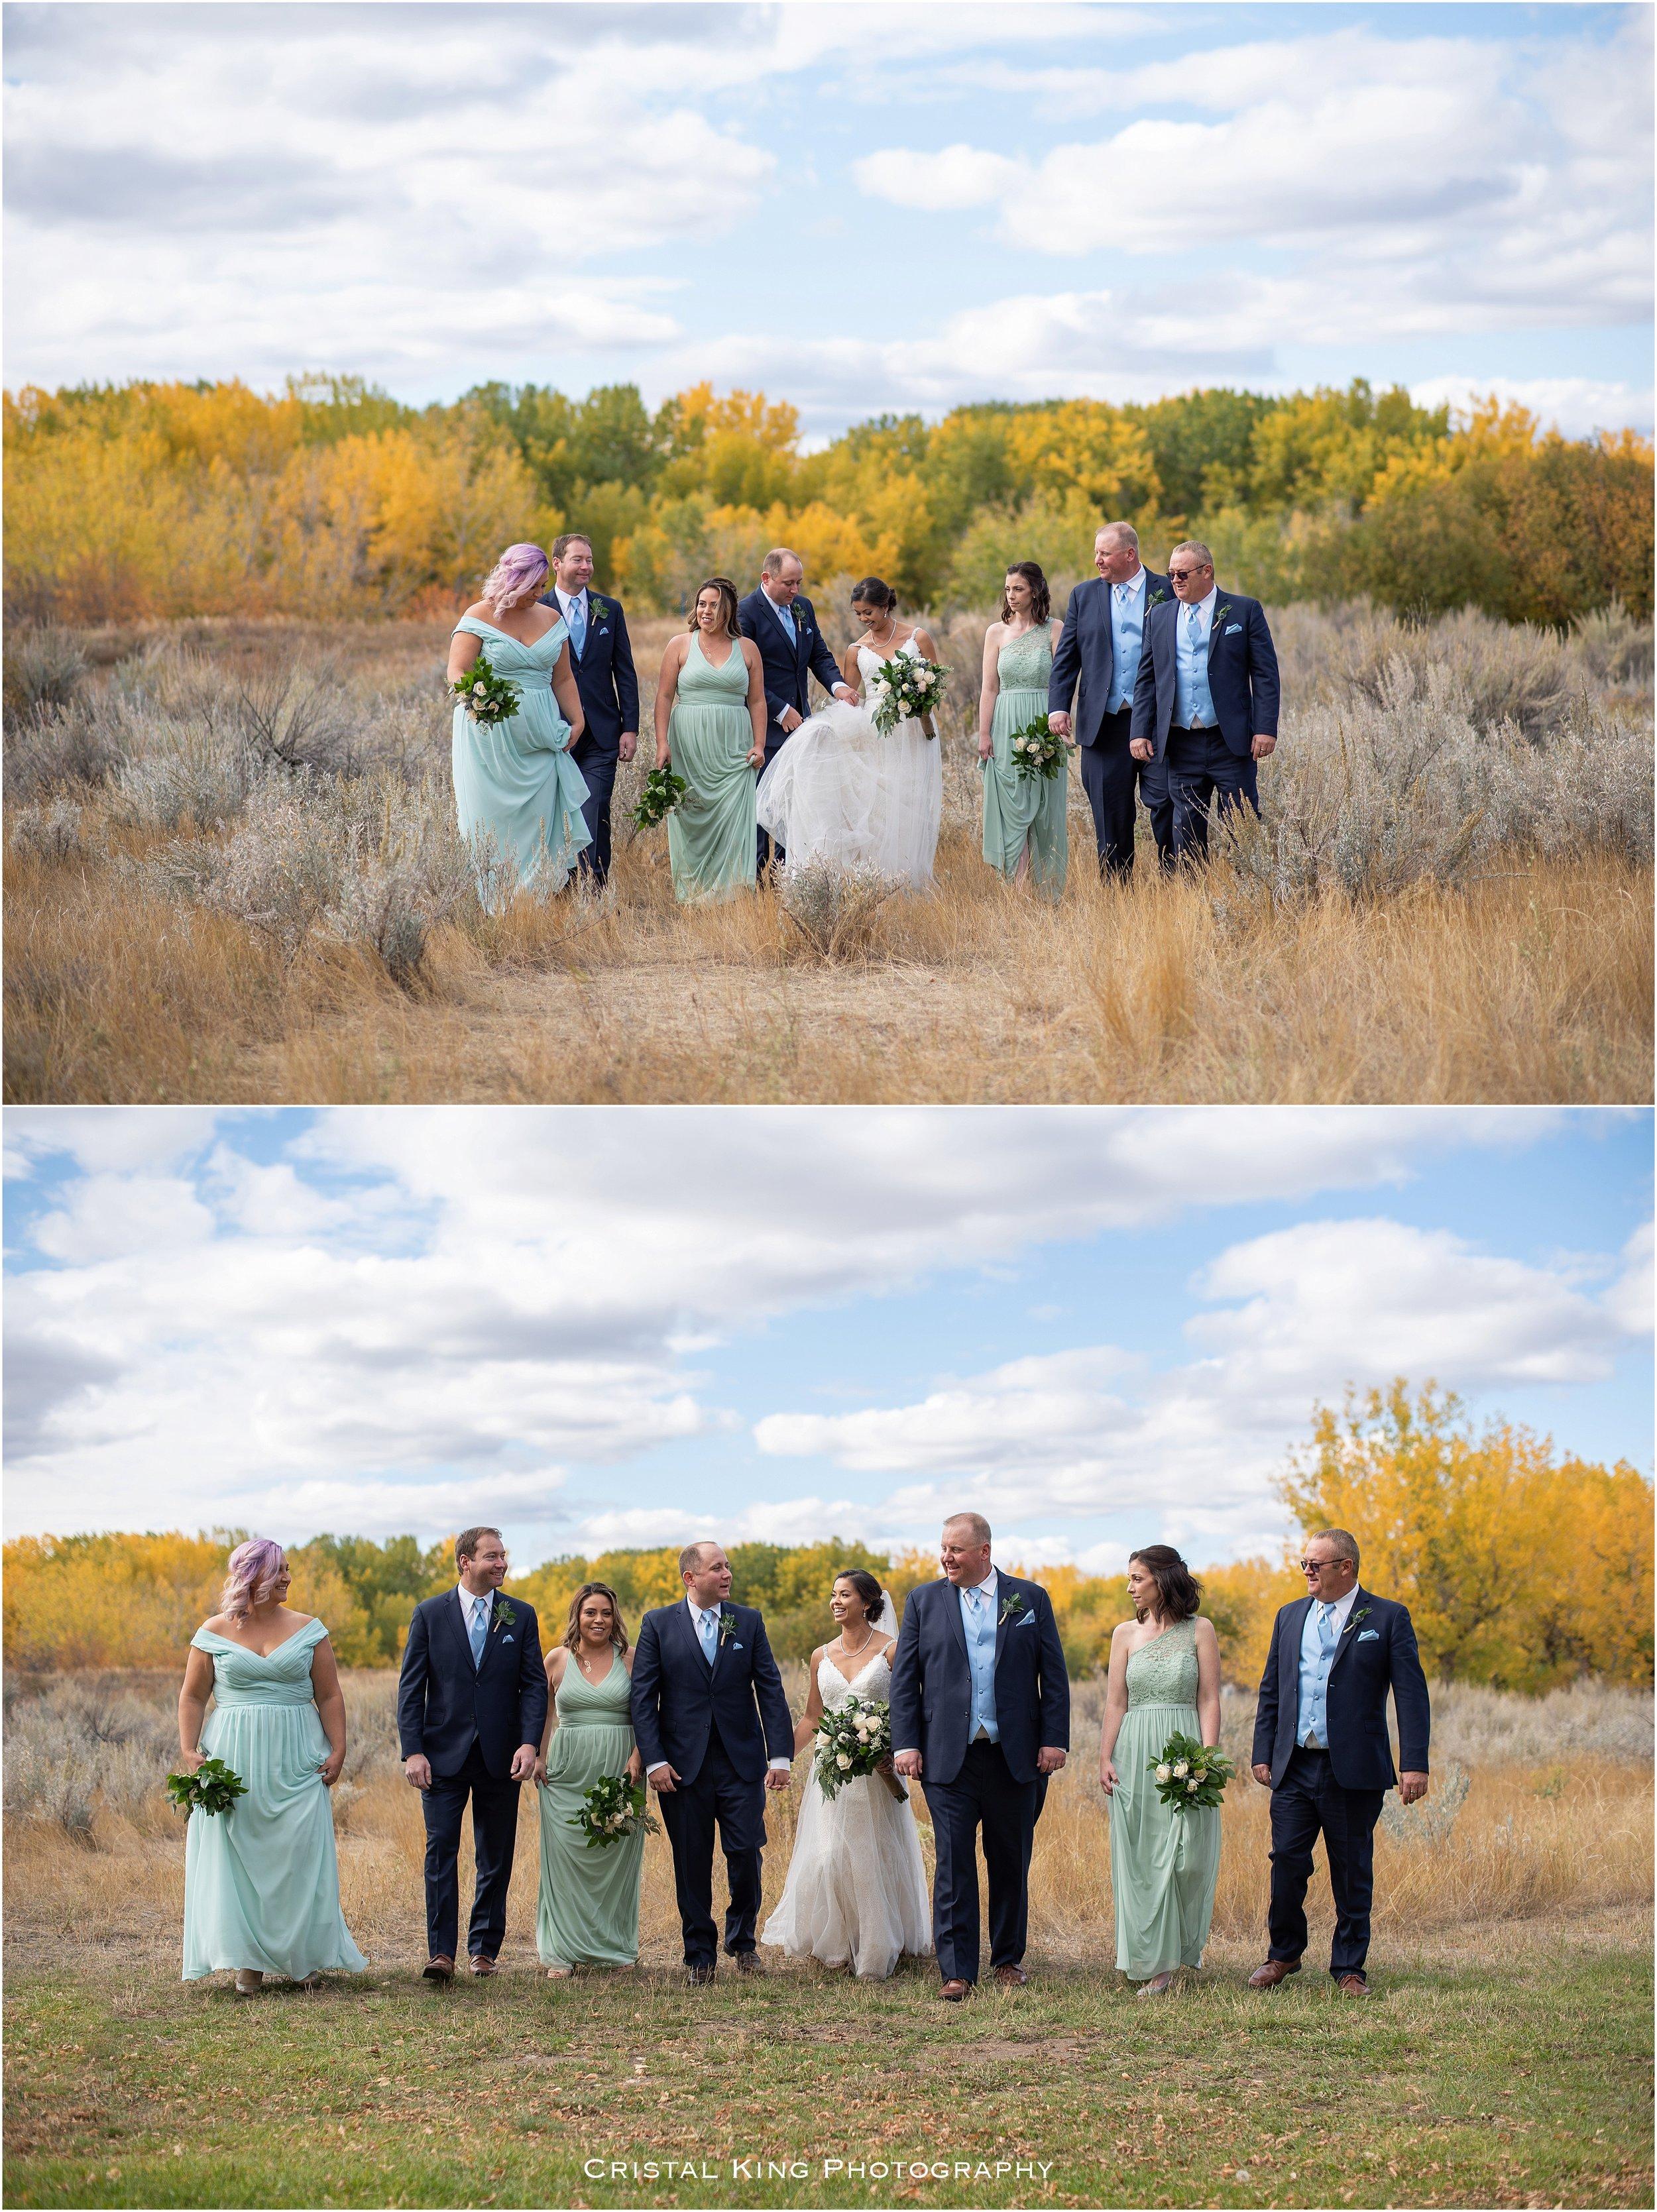 Quynh-Scotts-Wedding-53.jpg